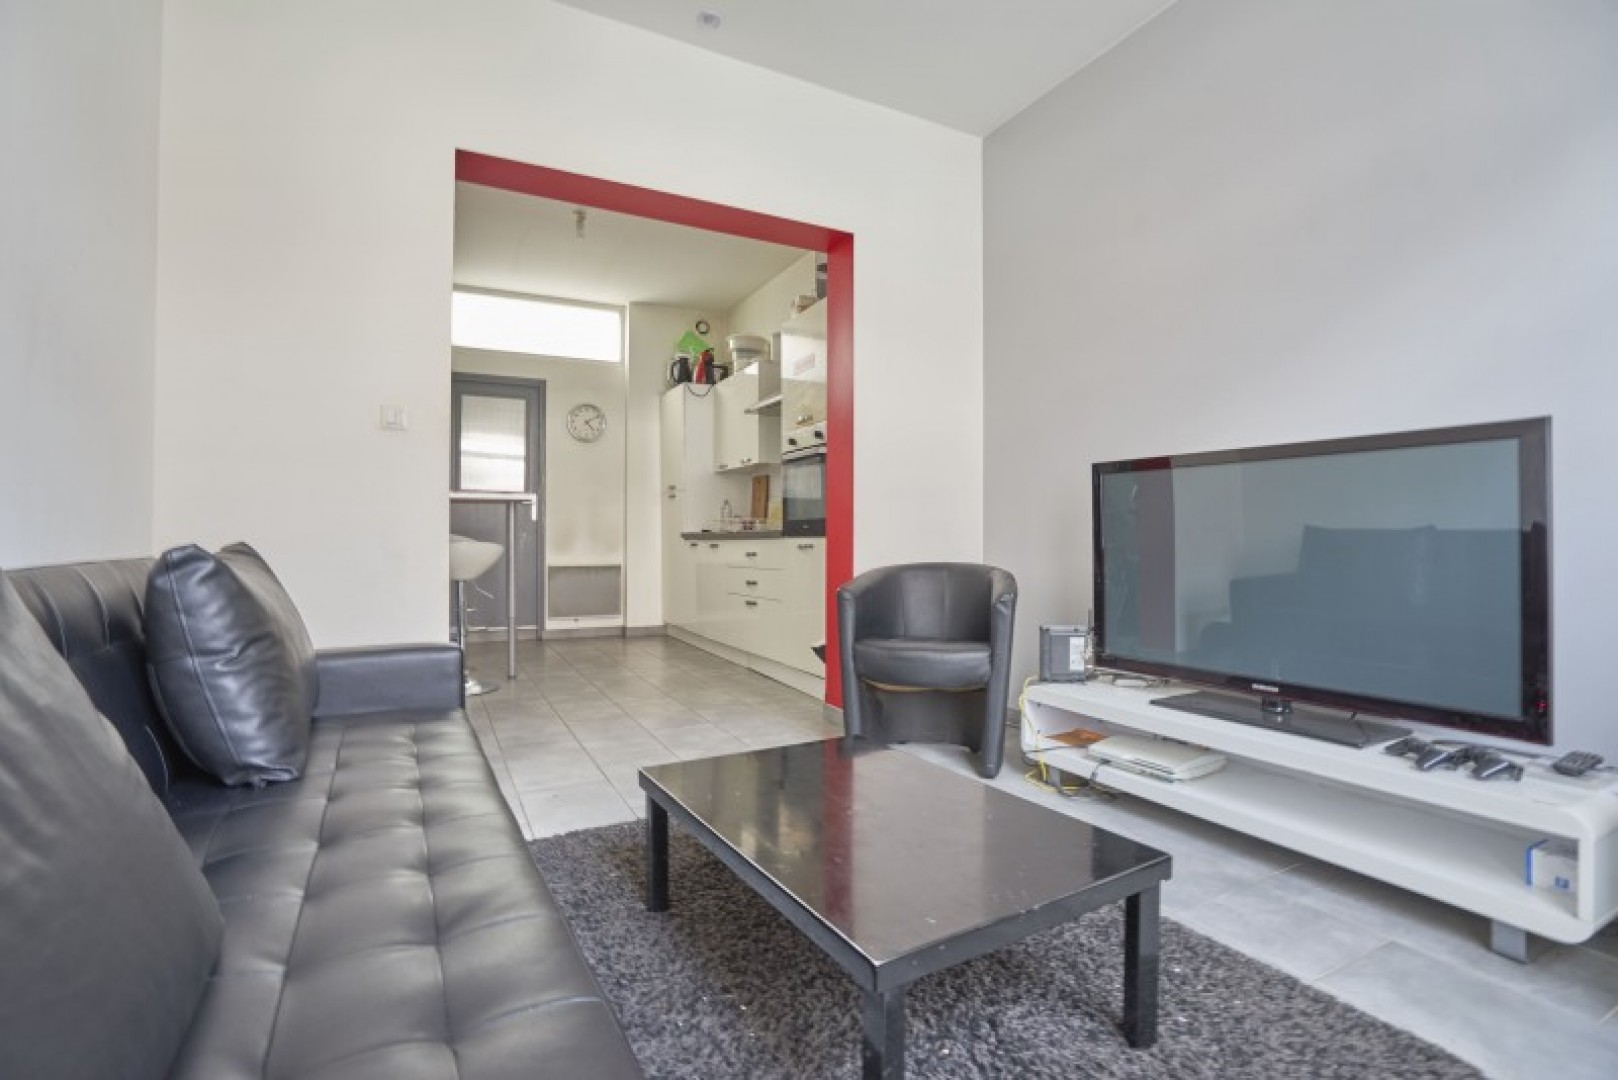 trouver une colocation lille colocatere. Black Bedroom Furniture Sets. Home Design Ideas